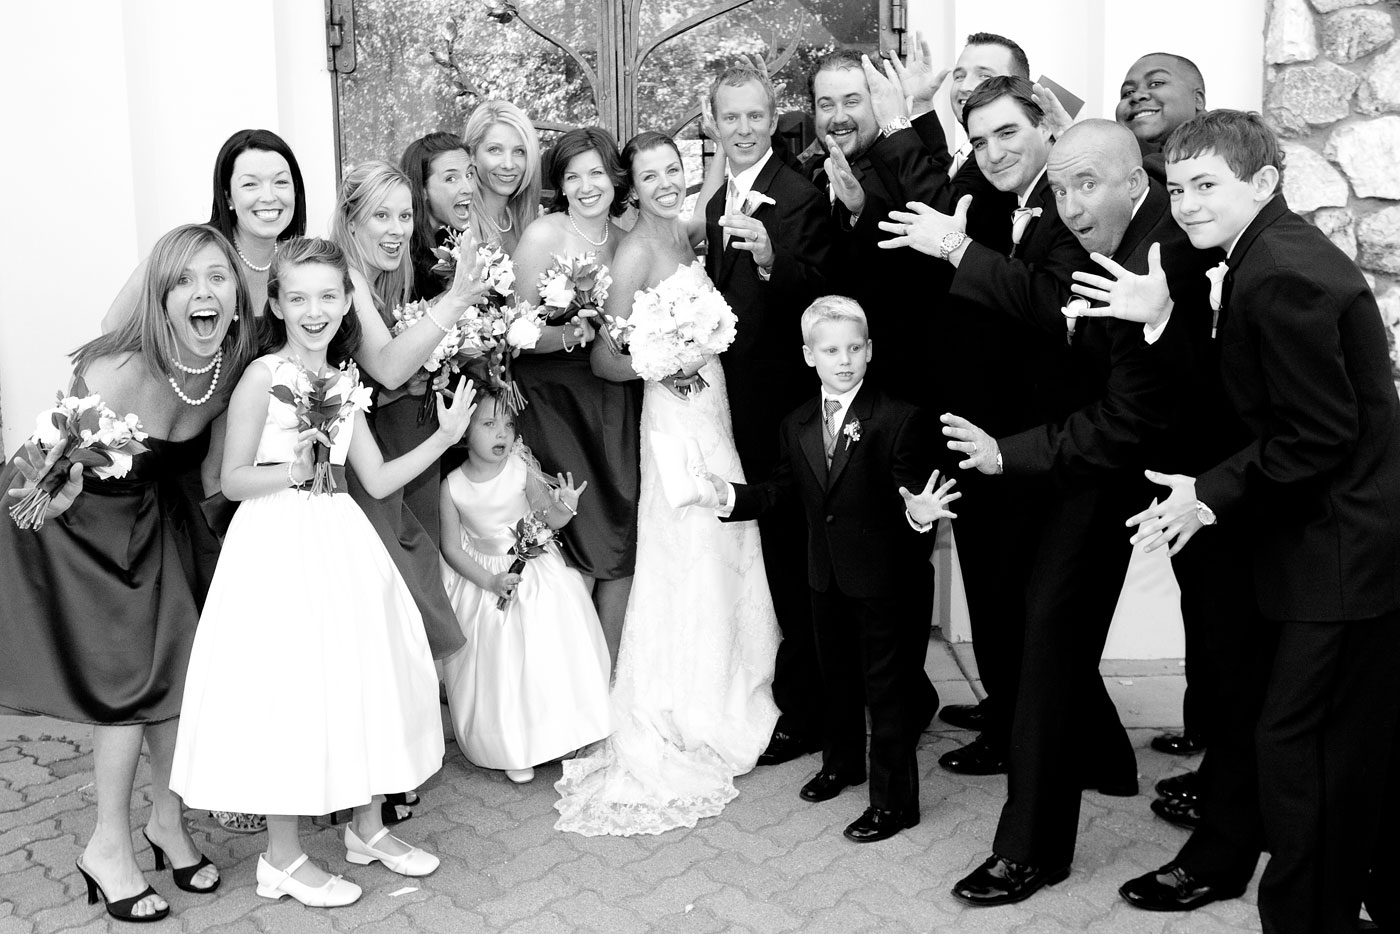 wedding-chapels-beaver-creek-axelphoto.jpg